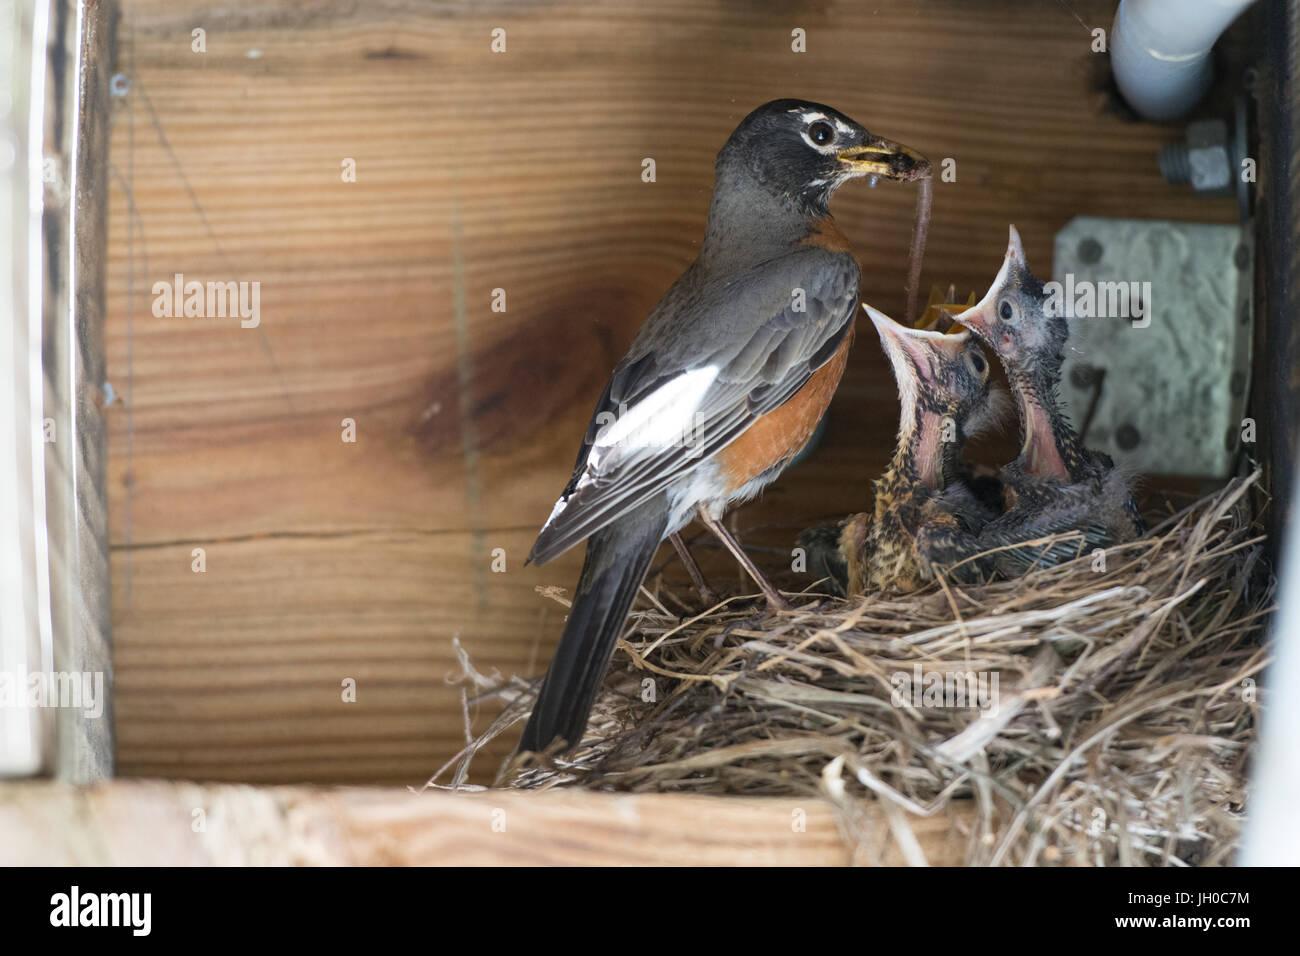 Robin feeding baby birds - Stock Image